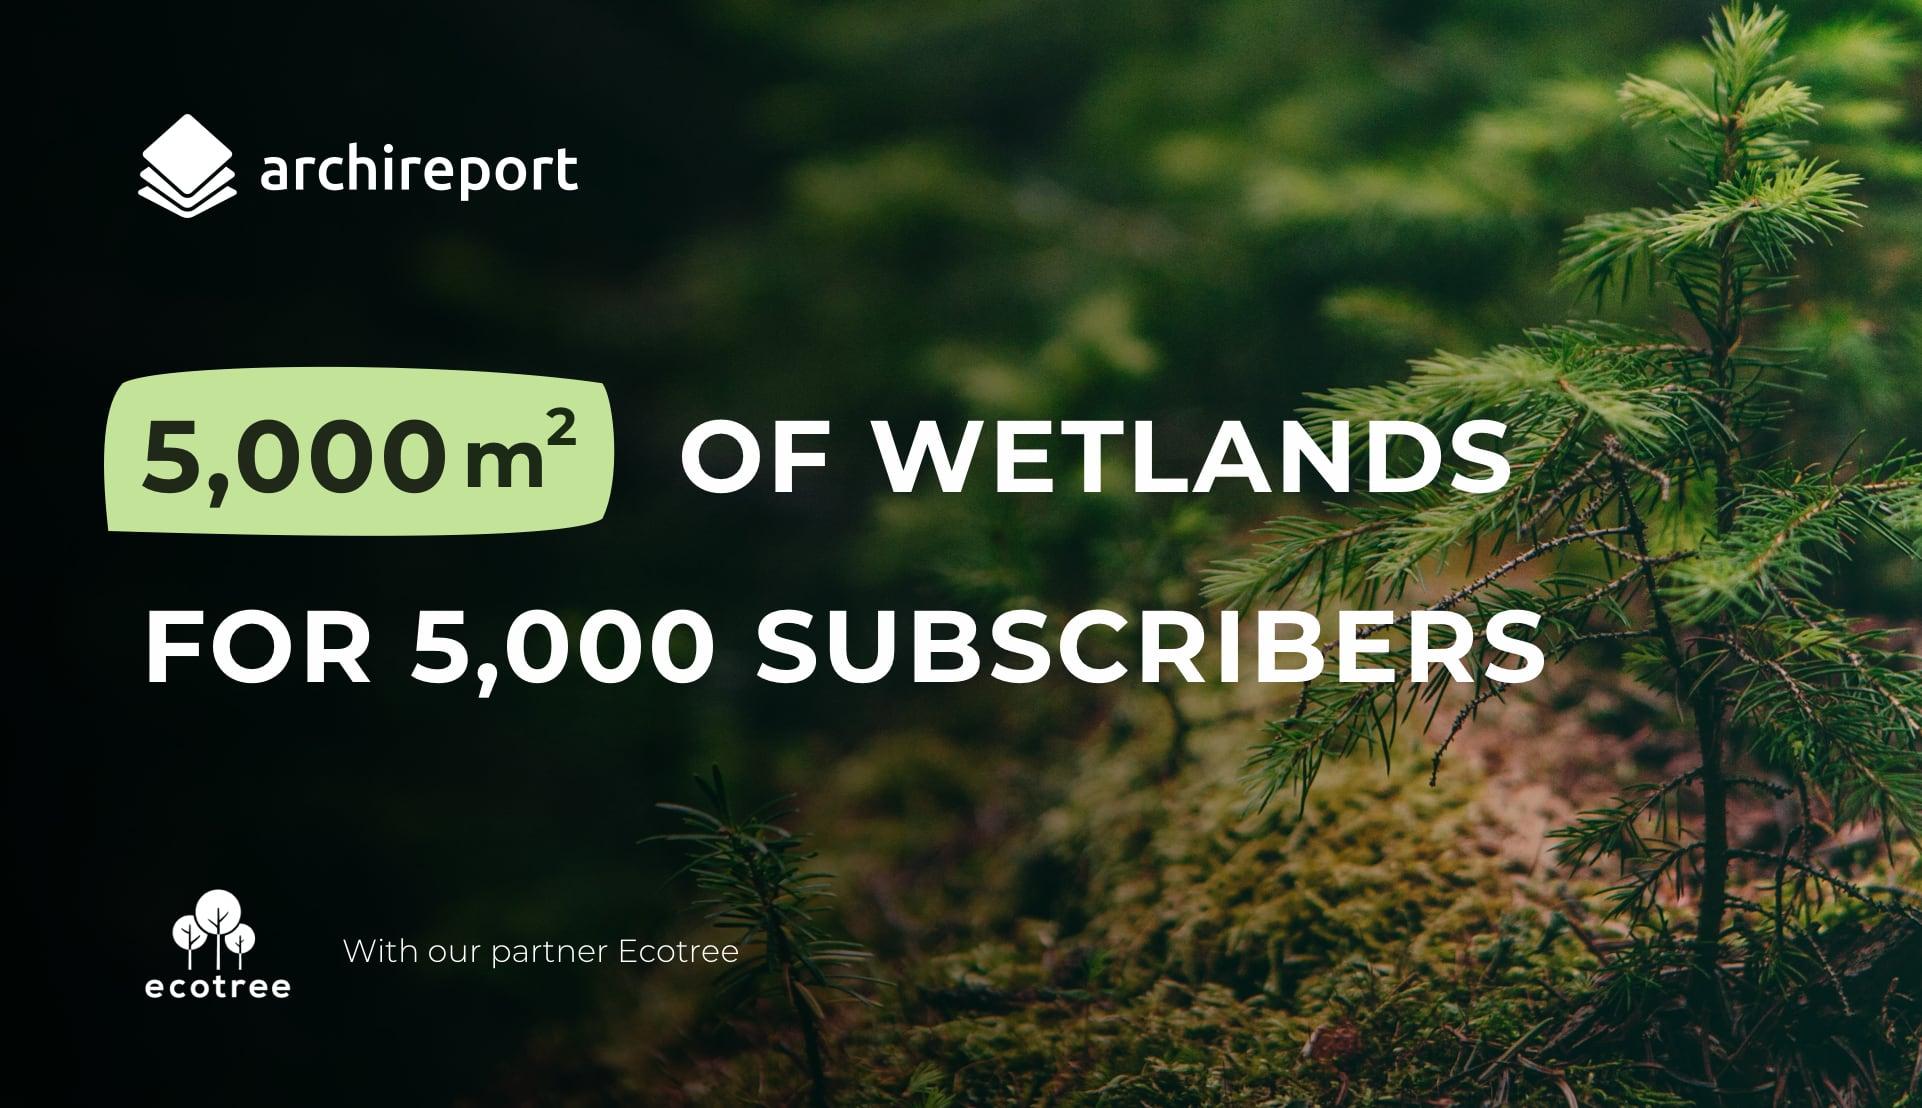 5,000 m2 of wetlands for 5,000 subscribers